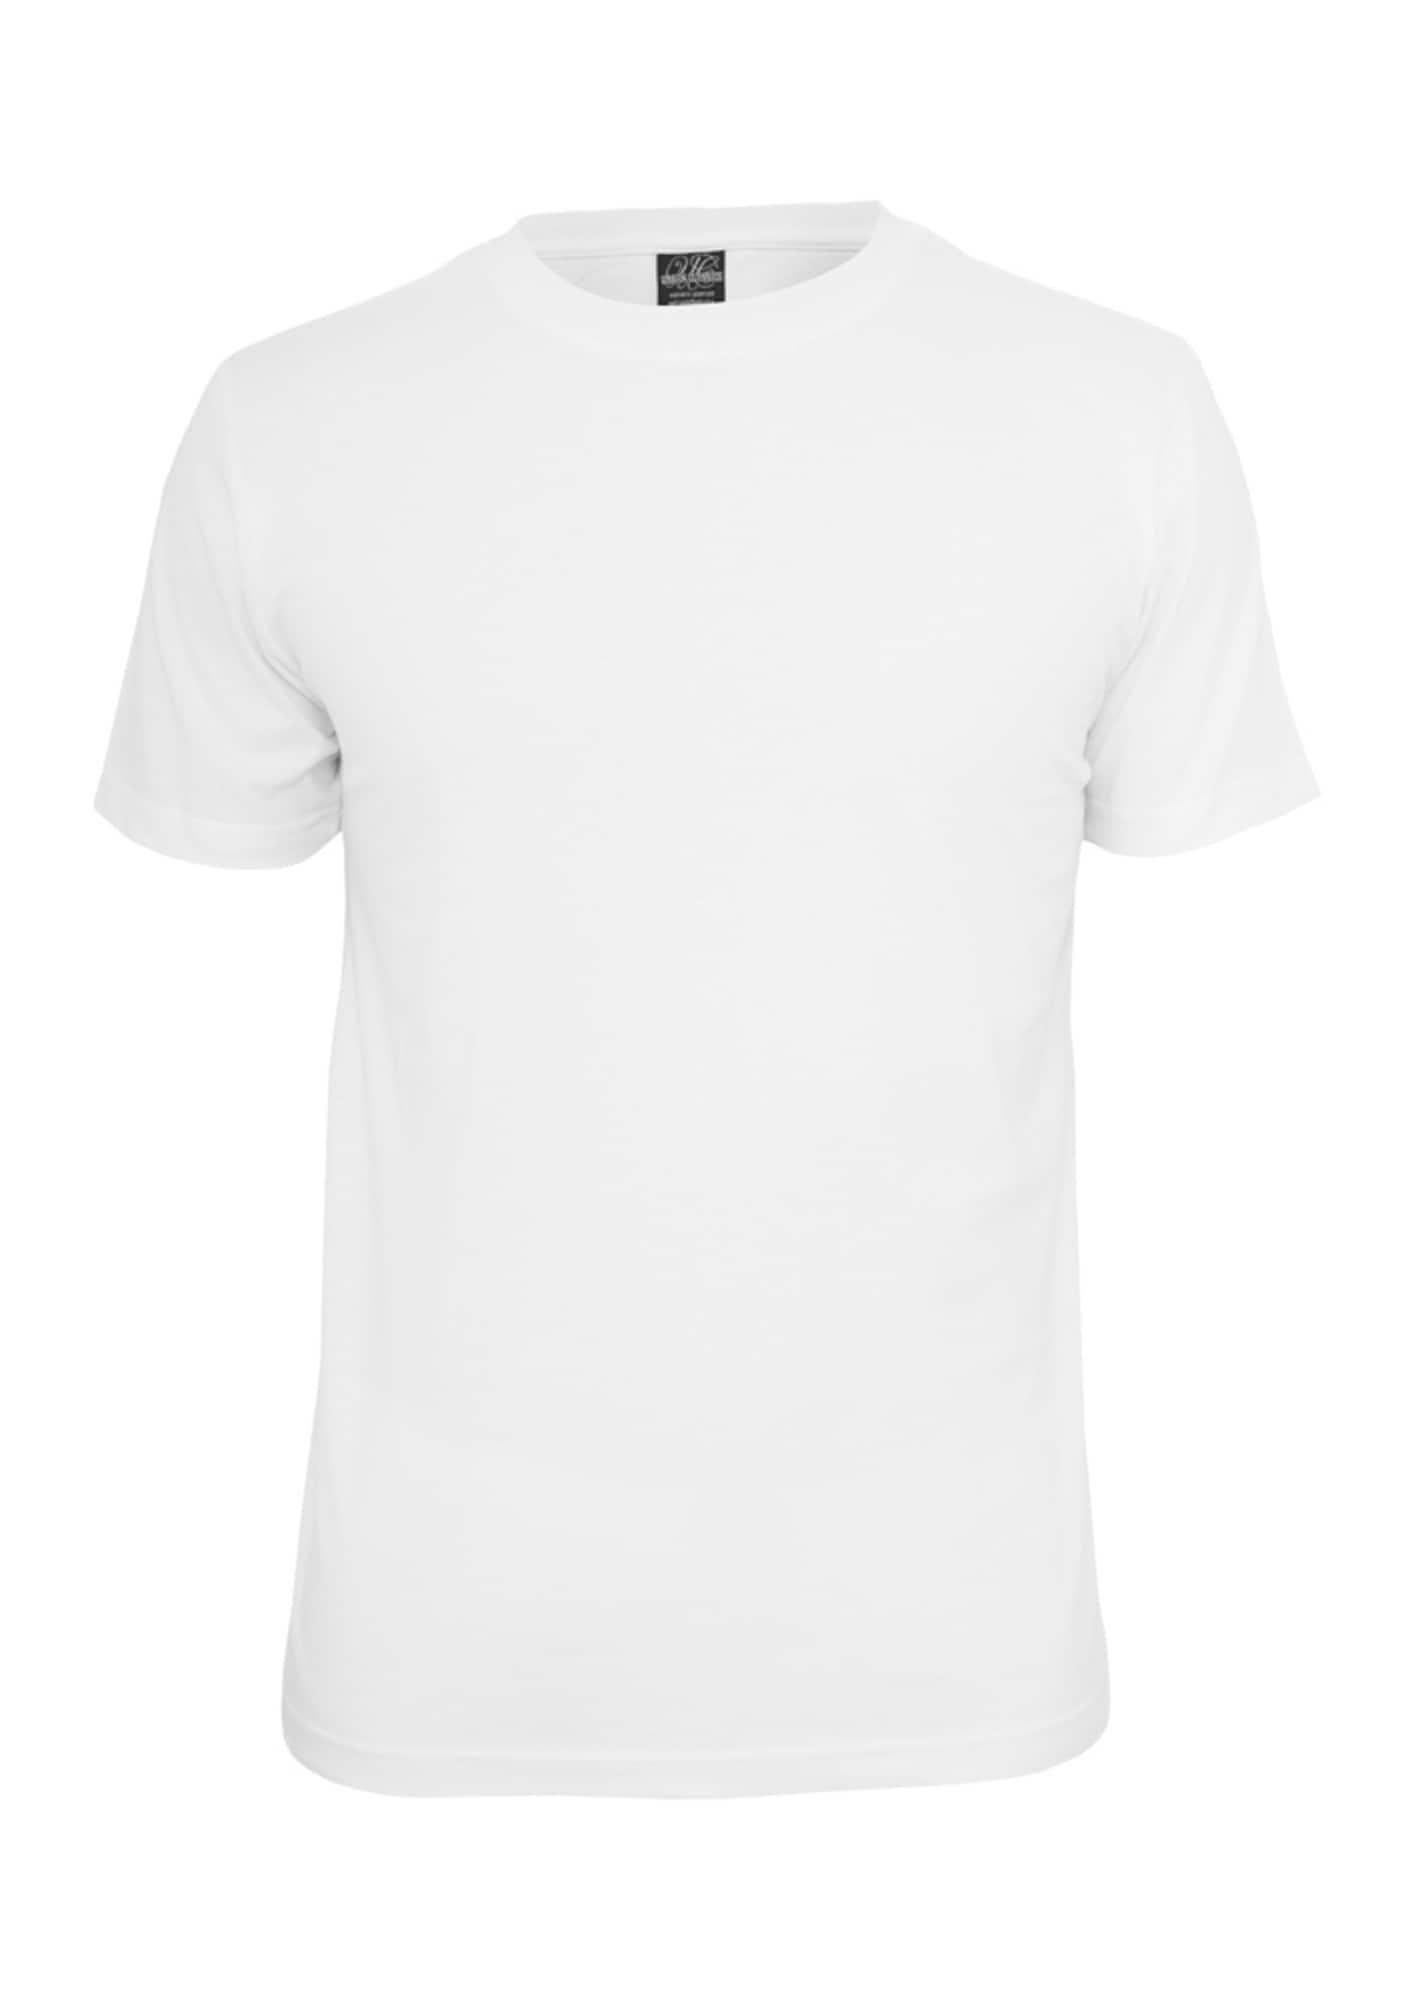 Urban Classics T-Shirt  - Blanc - Taille: XS - male